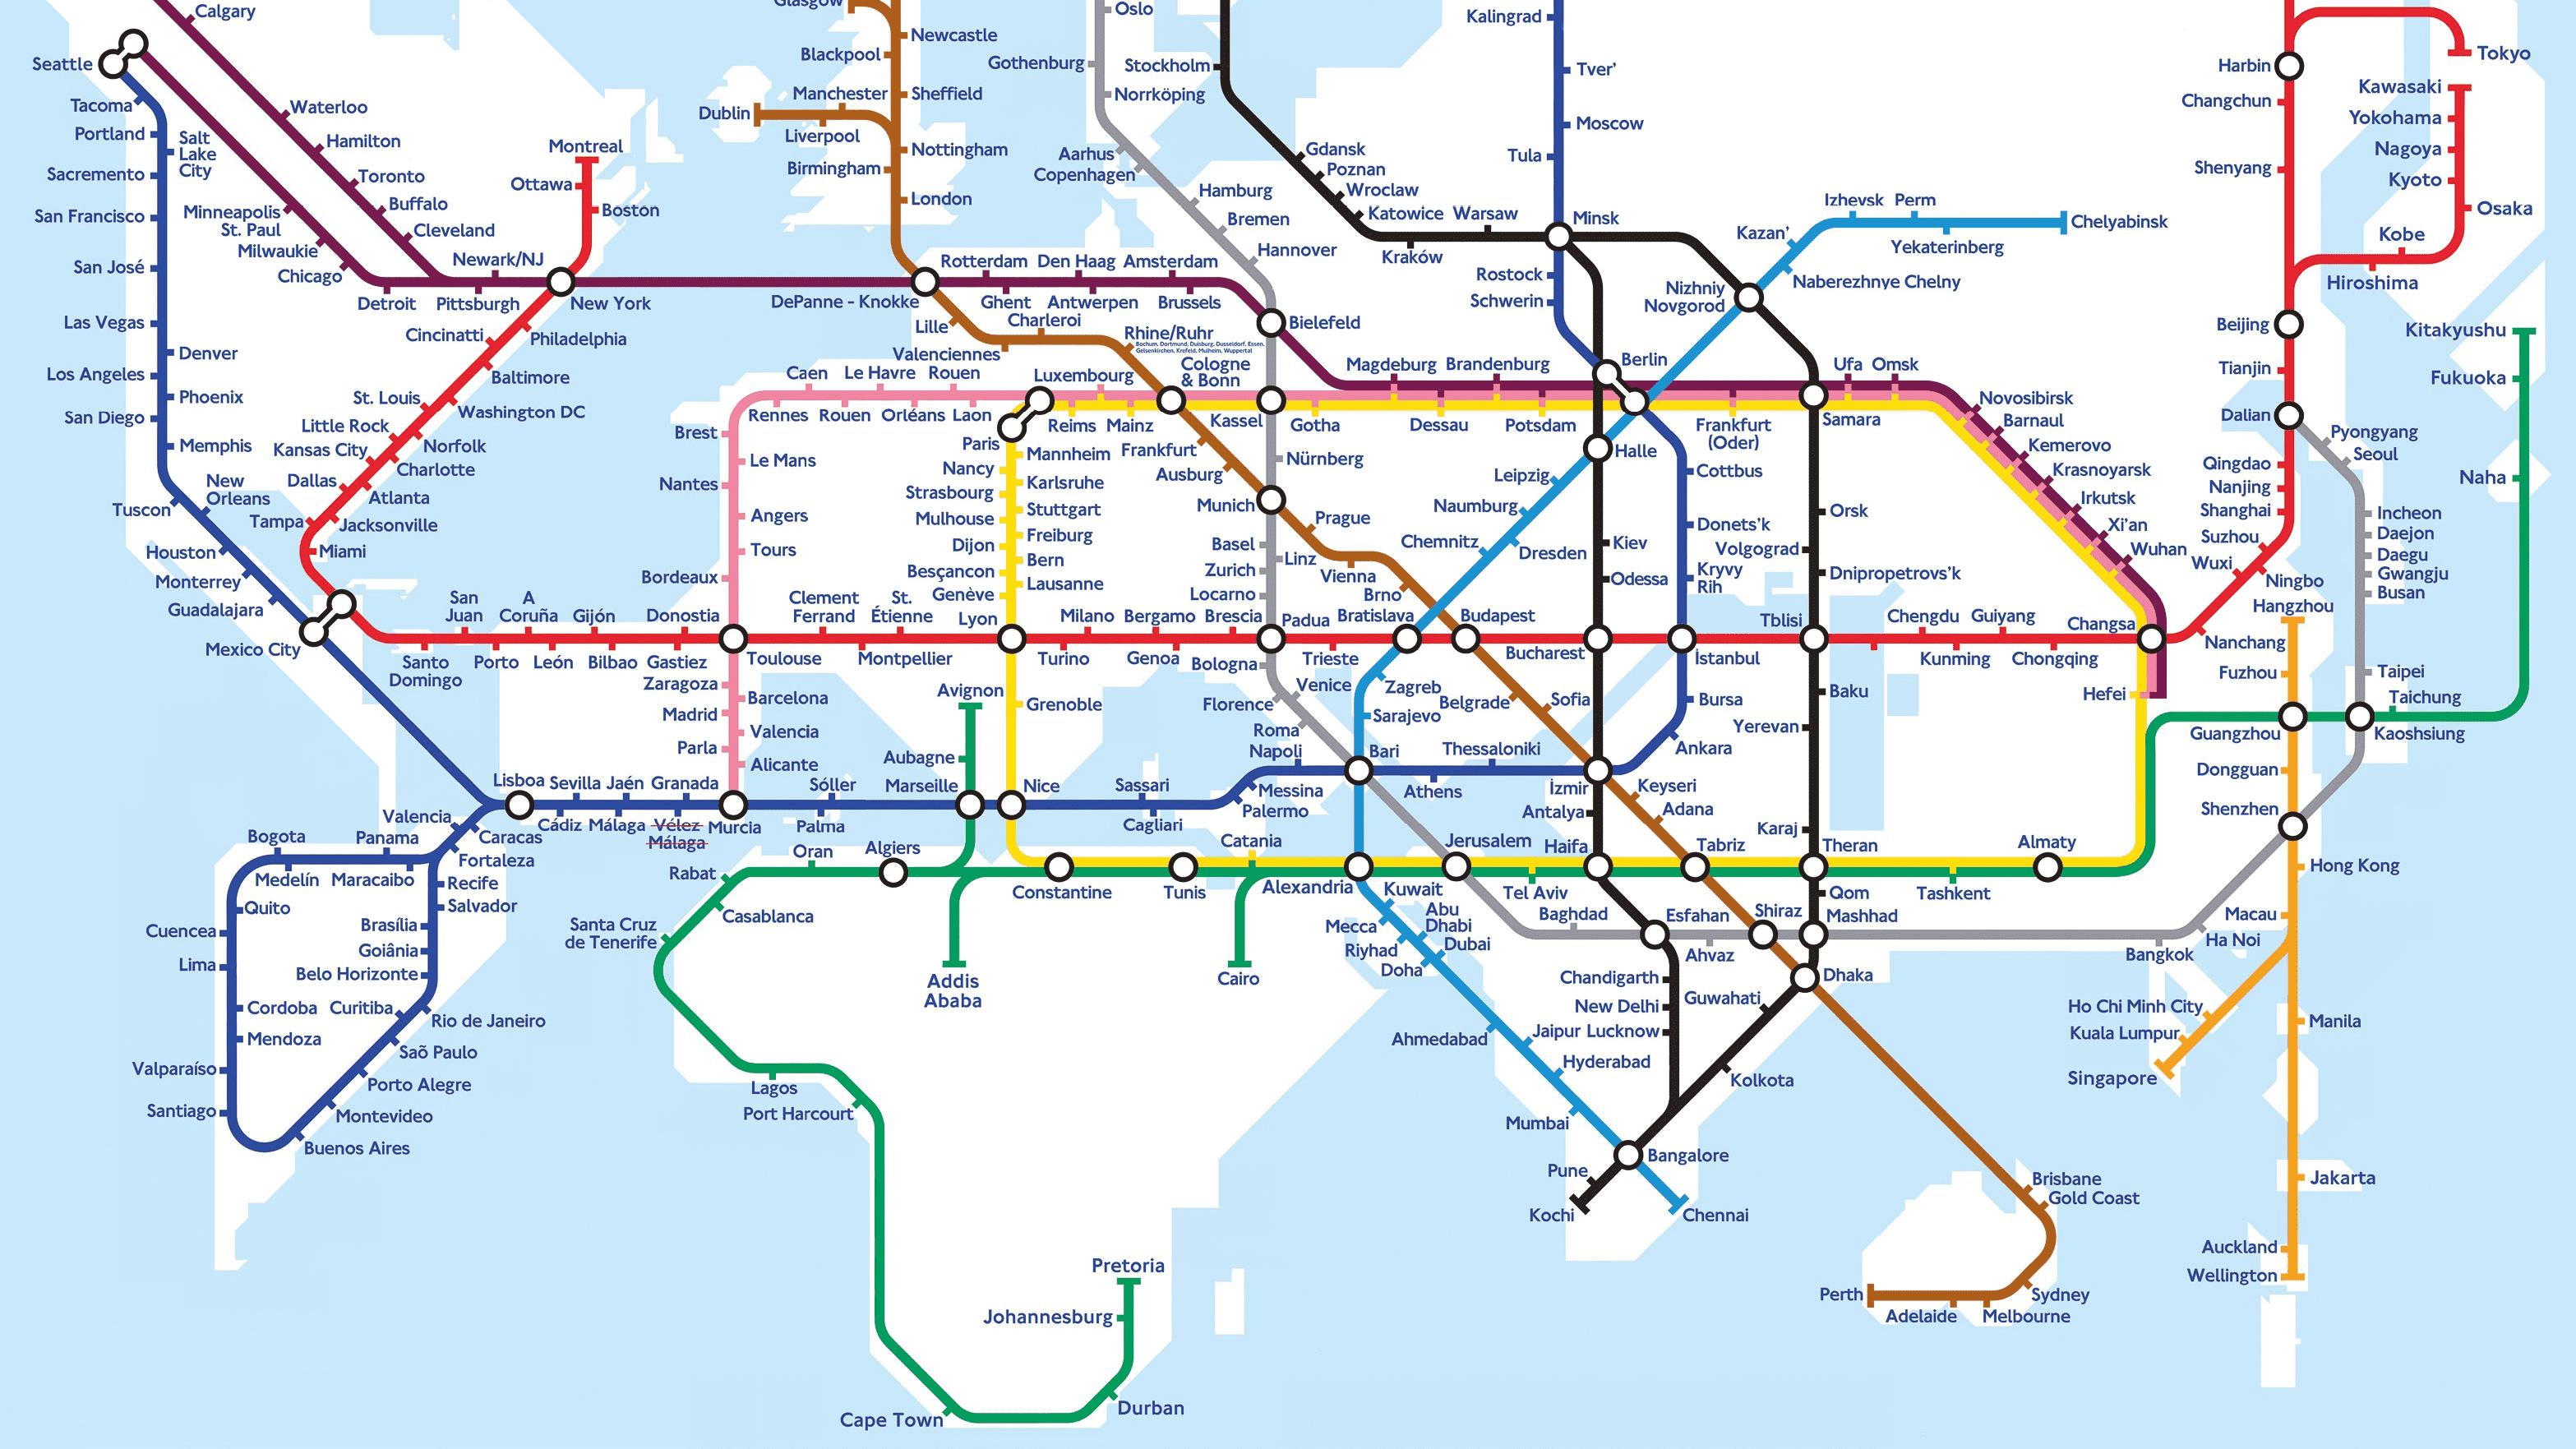 mapa del mundo tren molesta casi todo el mundo